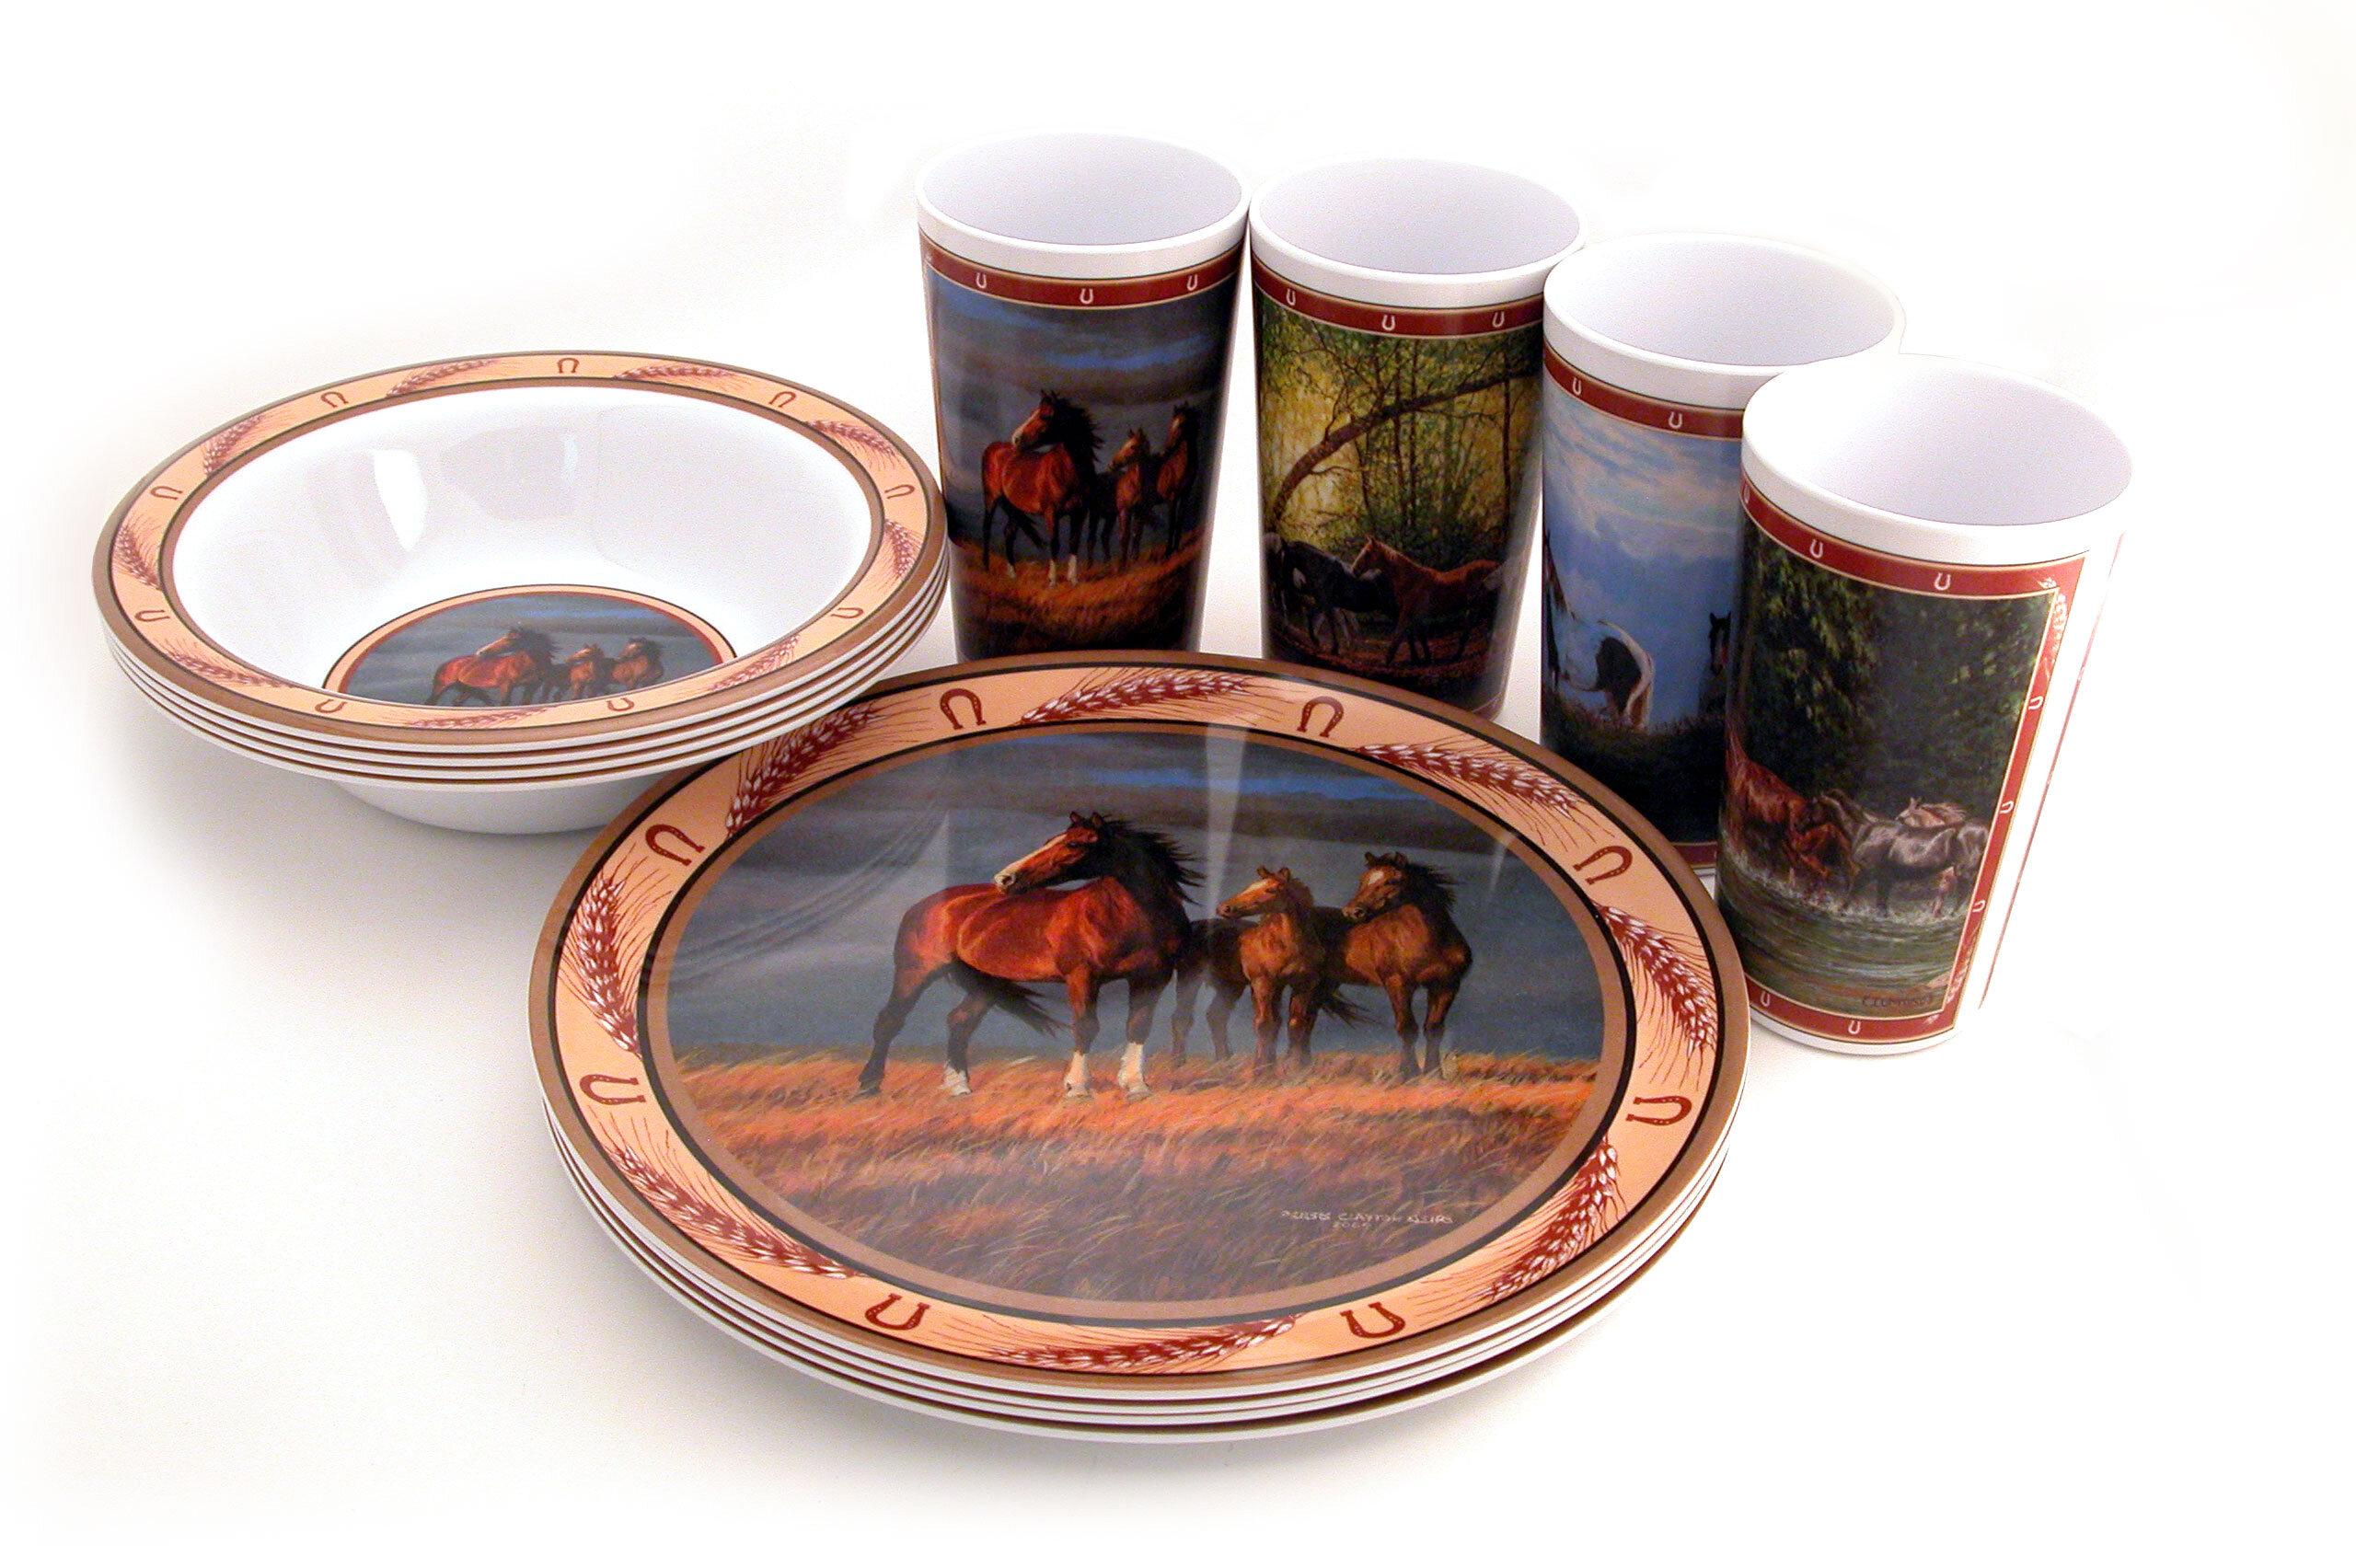 MotorHead Products Horse Melamine 12 Piece Dinnerware Set Service for 4 u0026 Reviews | Wayfair  sc 1 st  Wayfair & MotorHead Products Horse Melamine 12 Piece Dinnerware Set Service ...